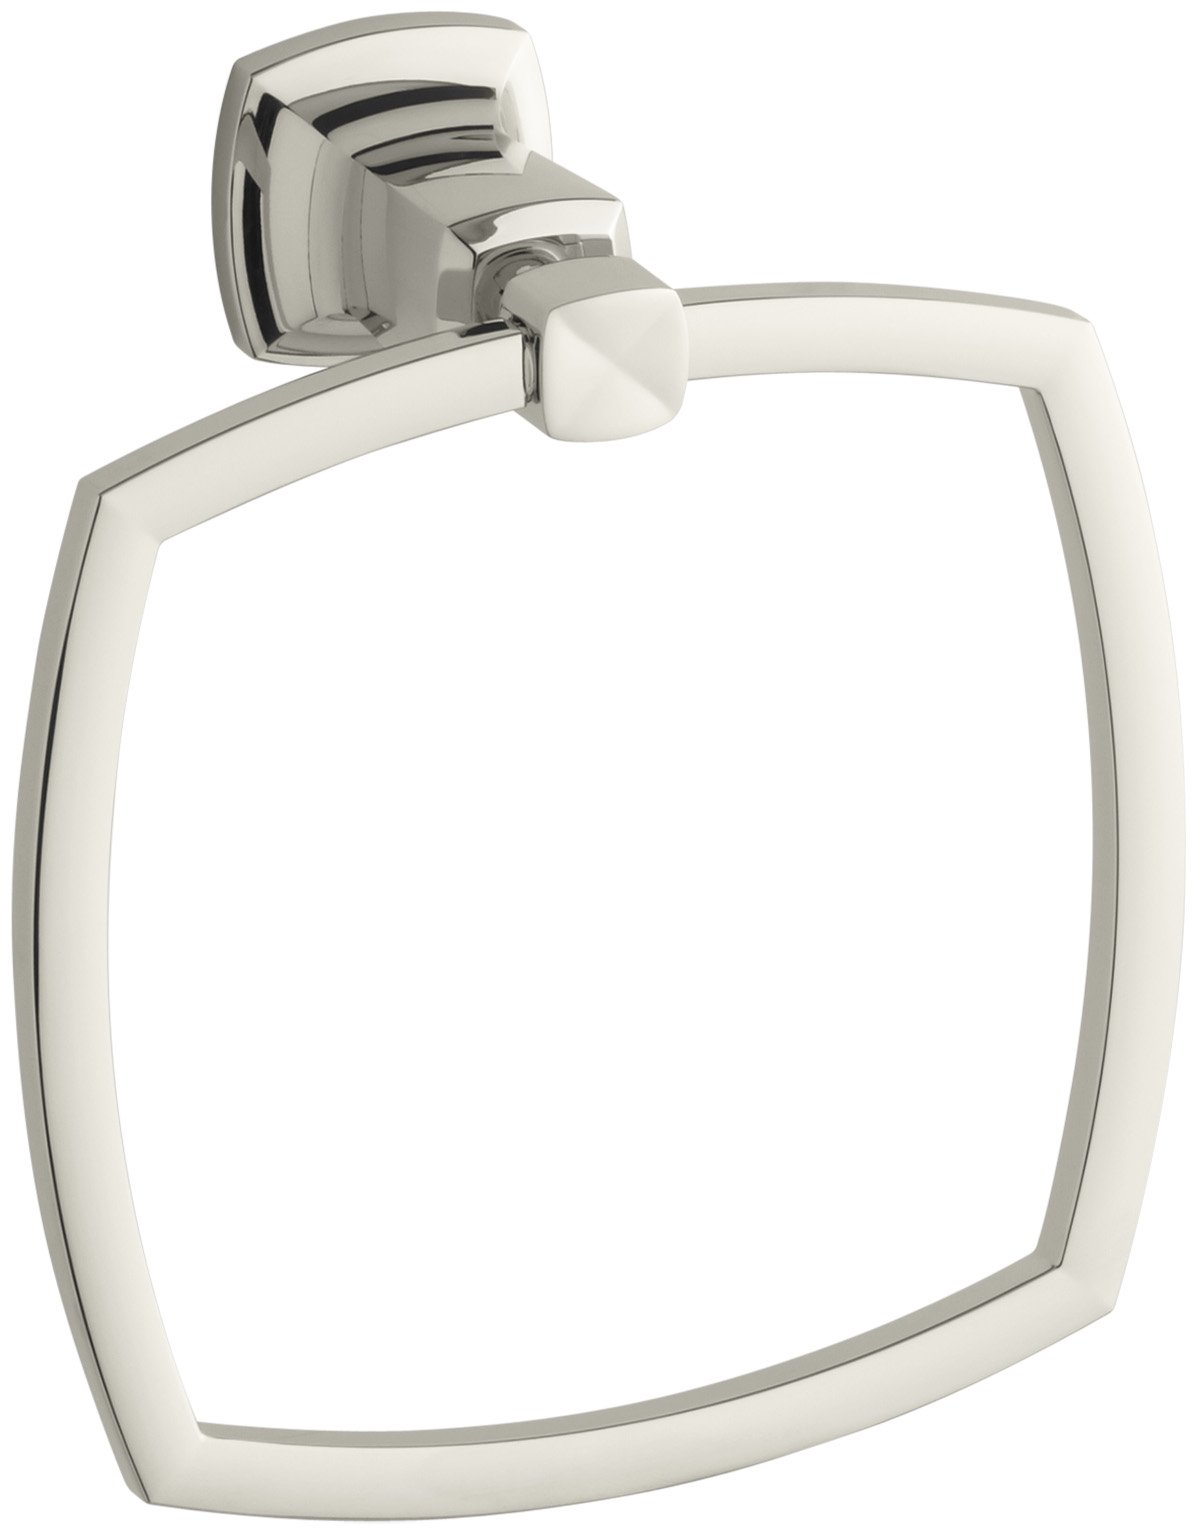 KOHLER K-16254-SN Margaux Towel Ring, Vibrant Polished Nickel